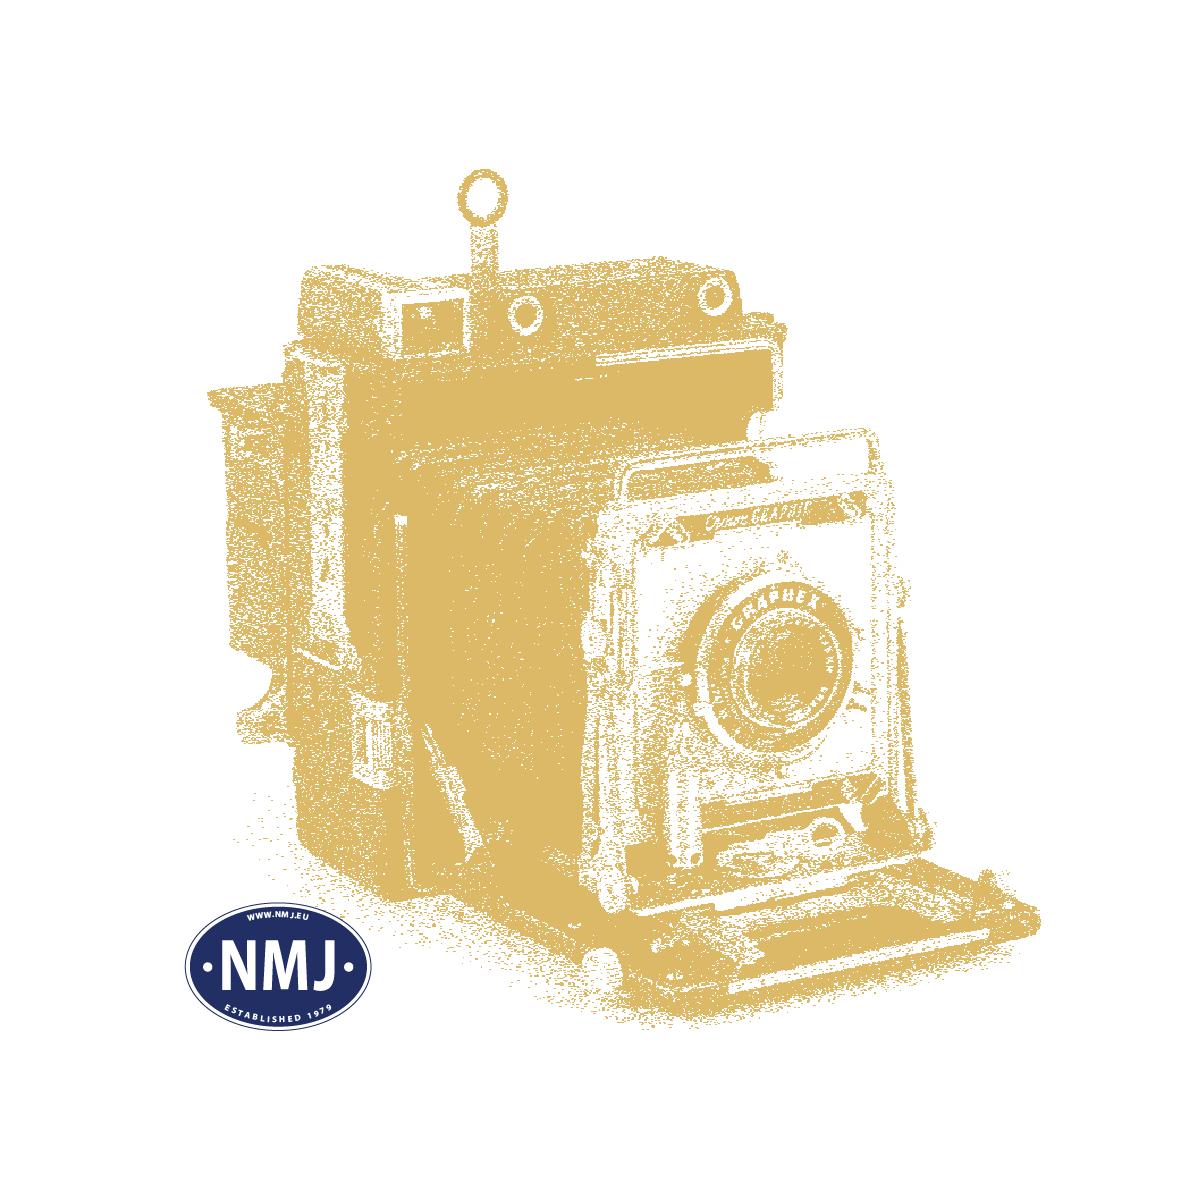 MIN737-32S - To-fargede Gresstuster, Sommer, 1:45+